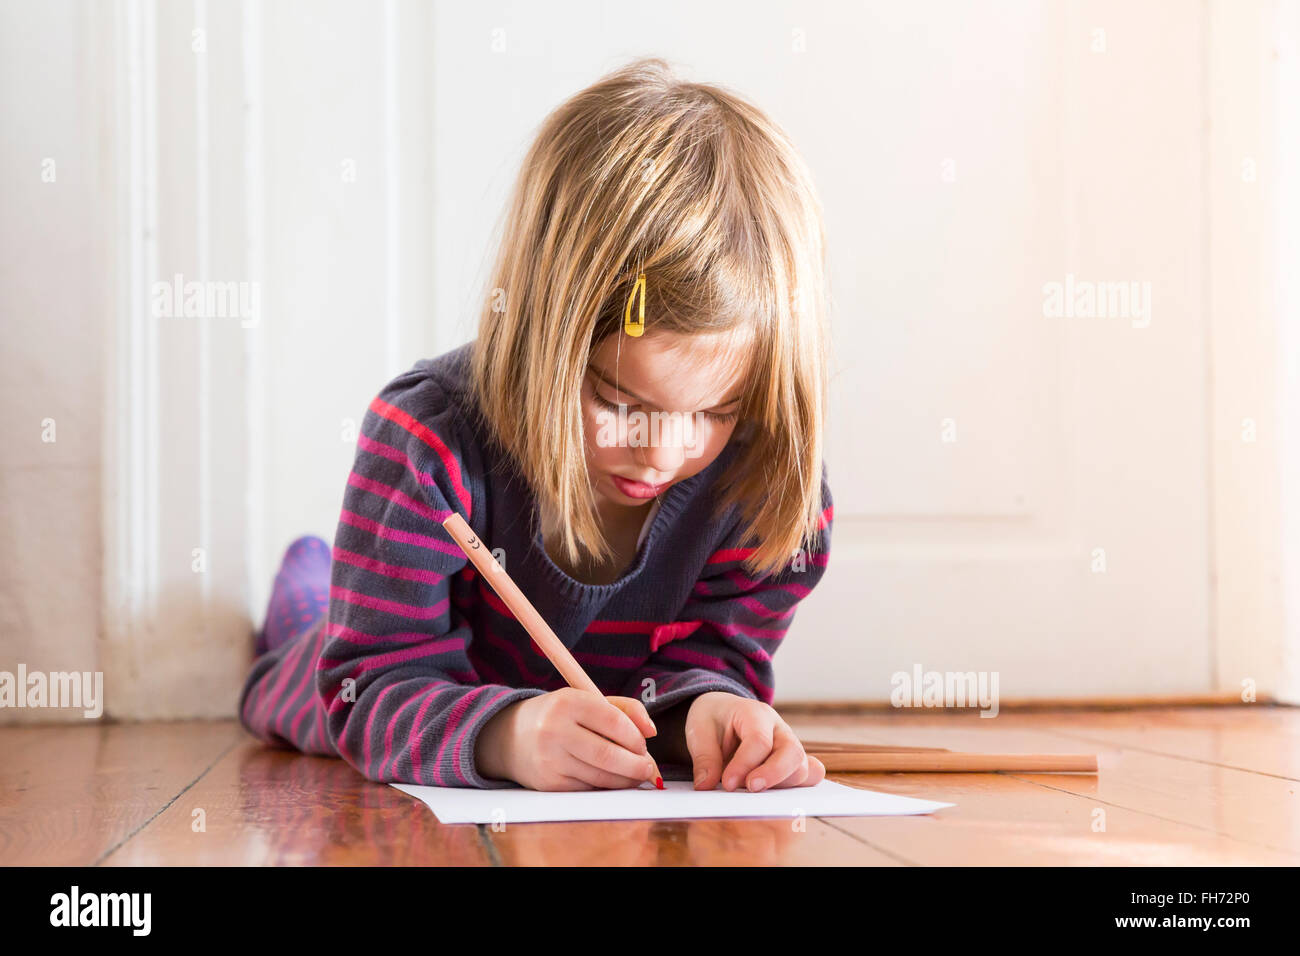 Little girl lying on the floor drawing something - Stock Image